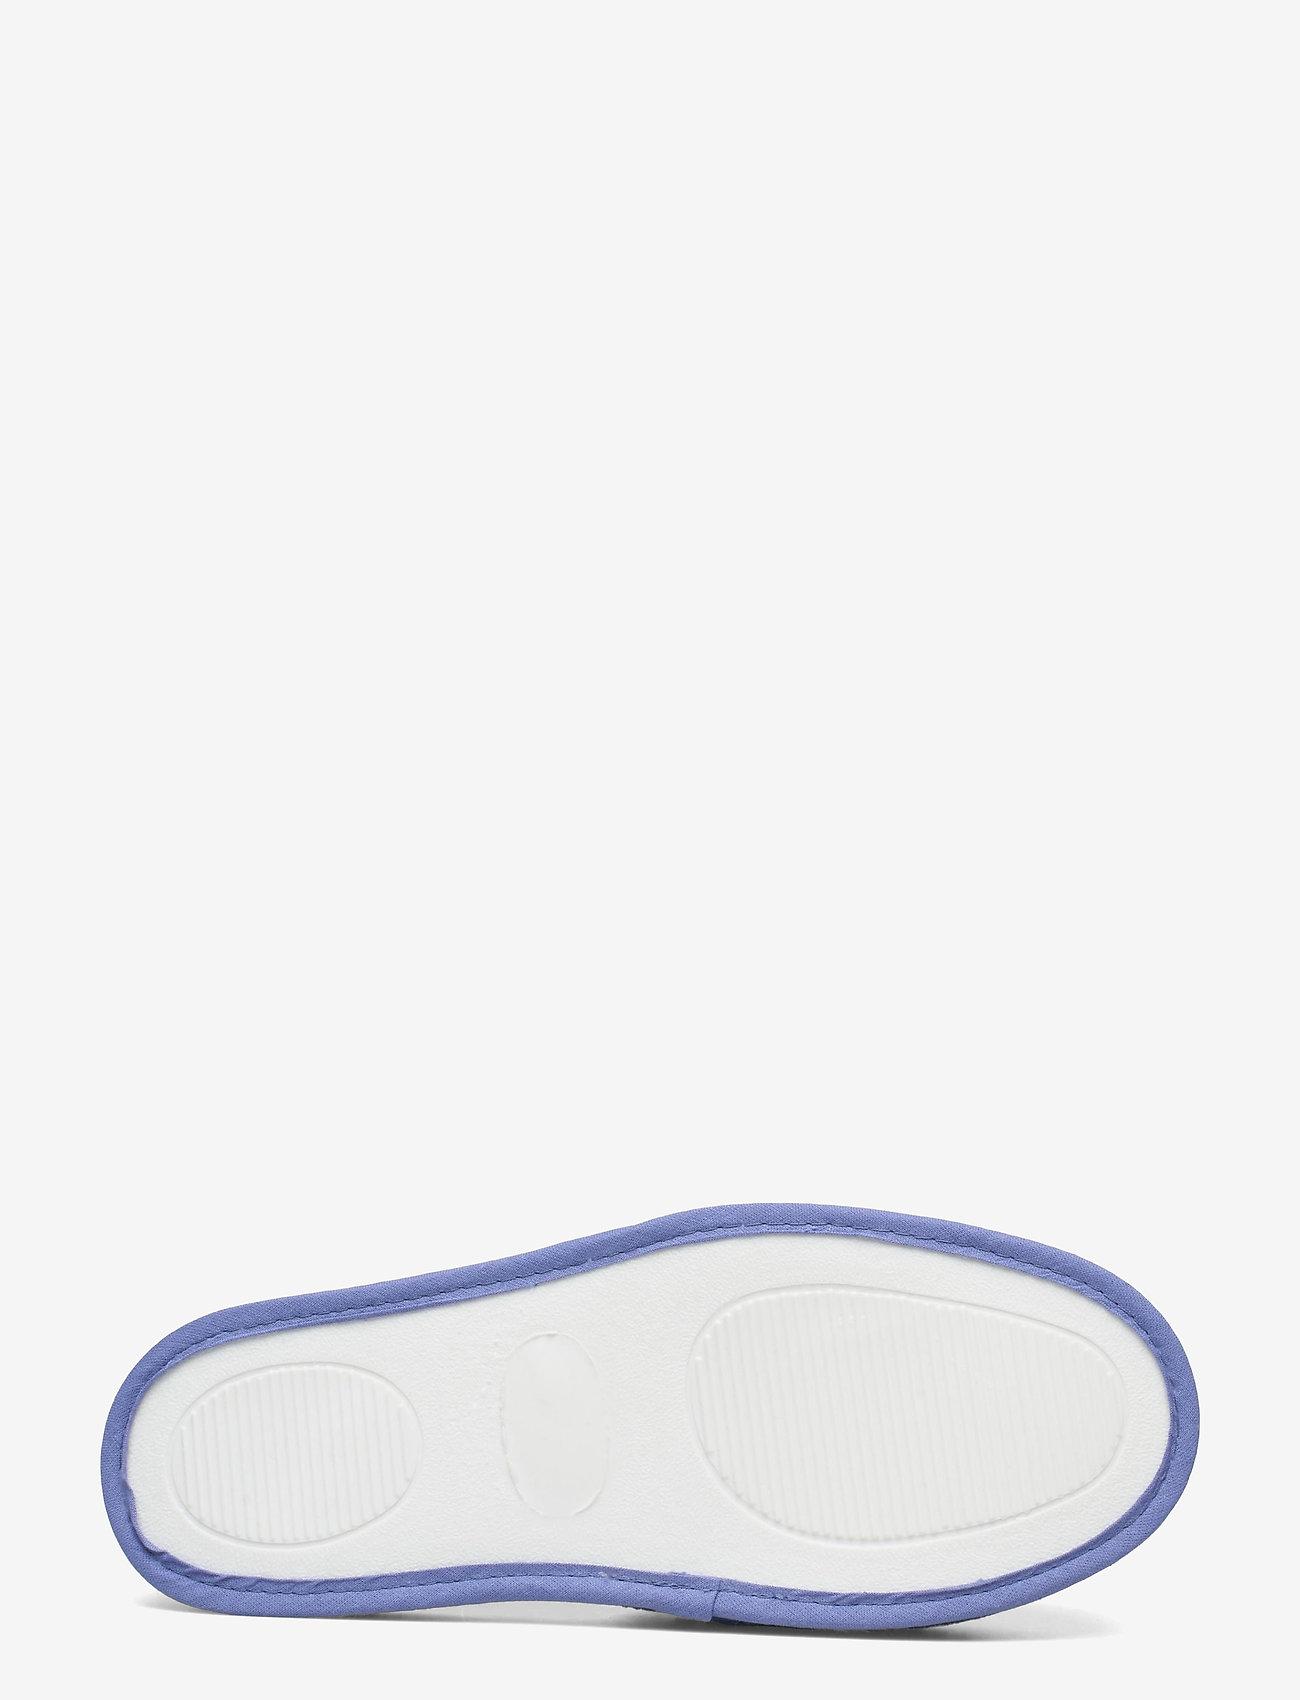 GANT - VACAY SLIPPERS - odzież - moonlight blue - 4